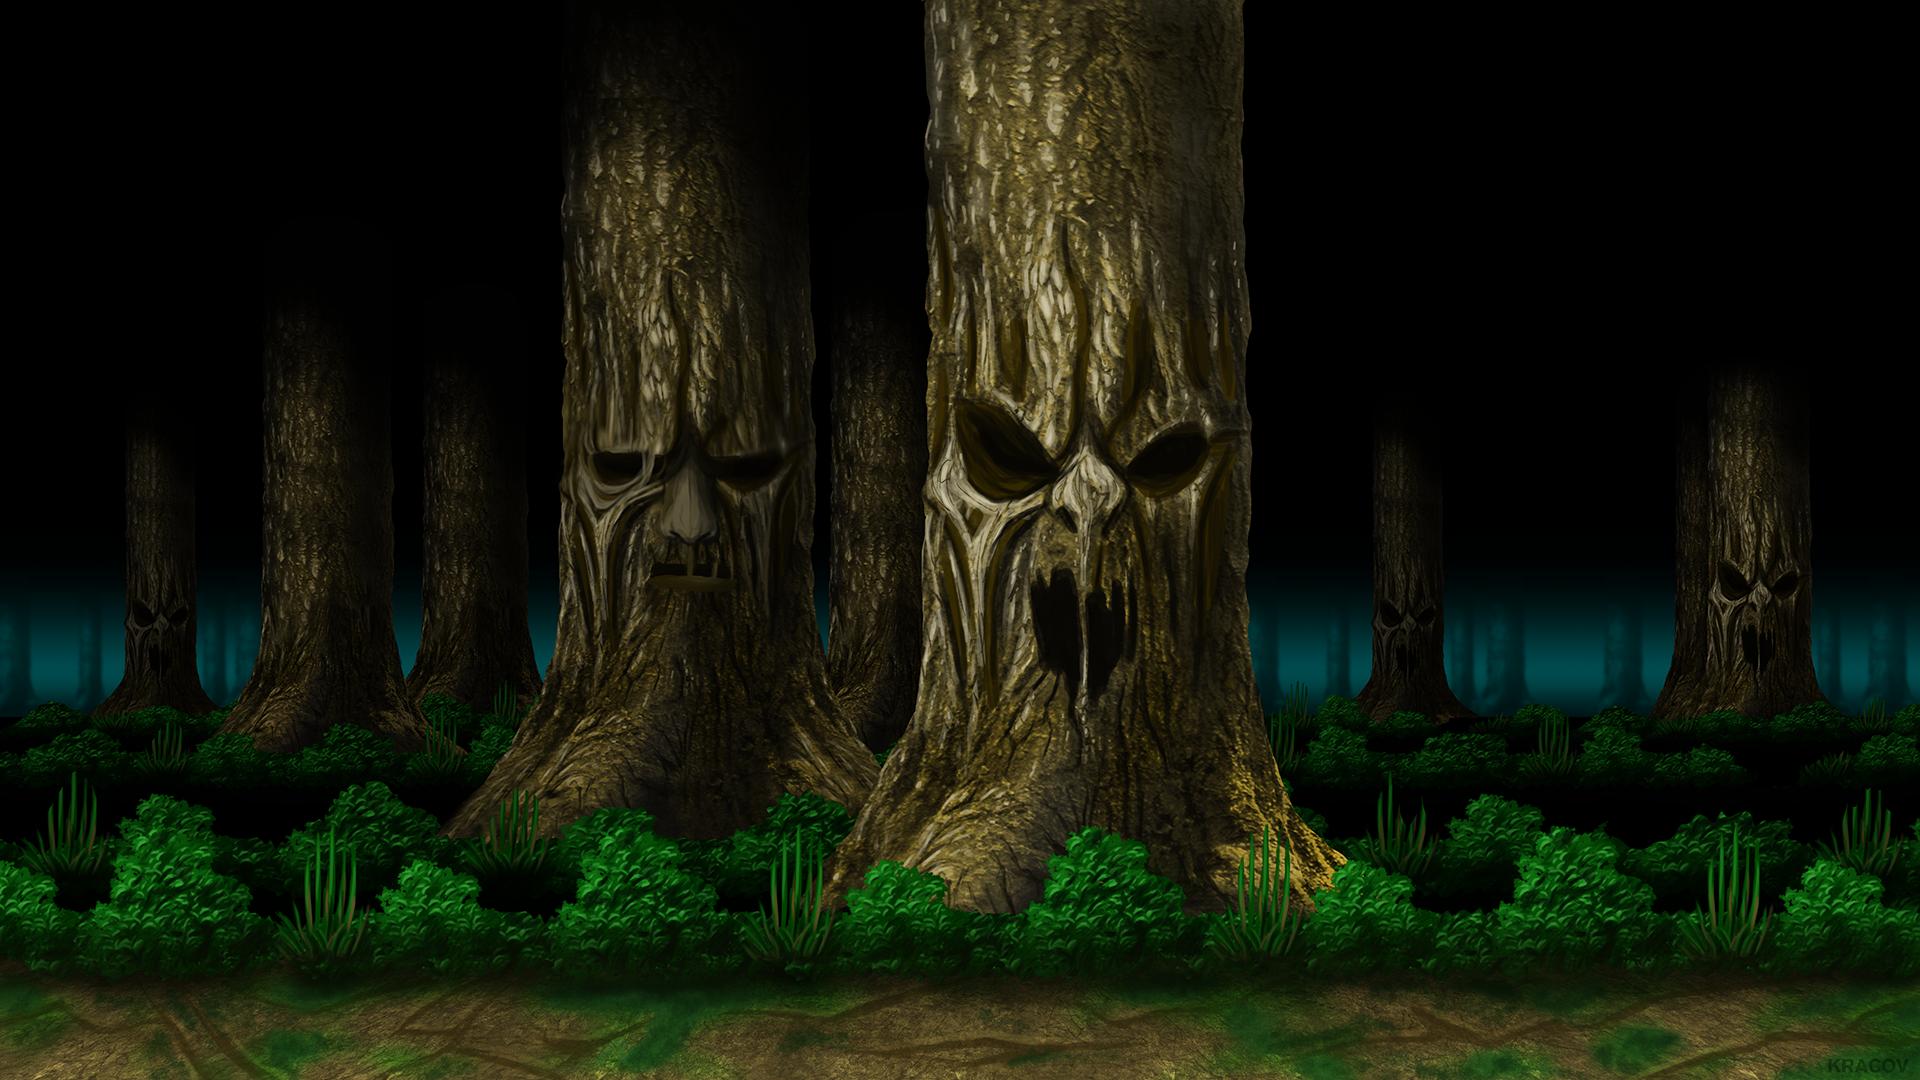 Mortal Kombat Living Forest HD by Kracov